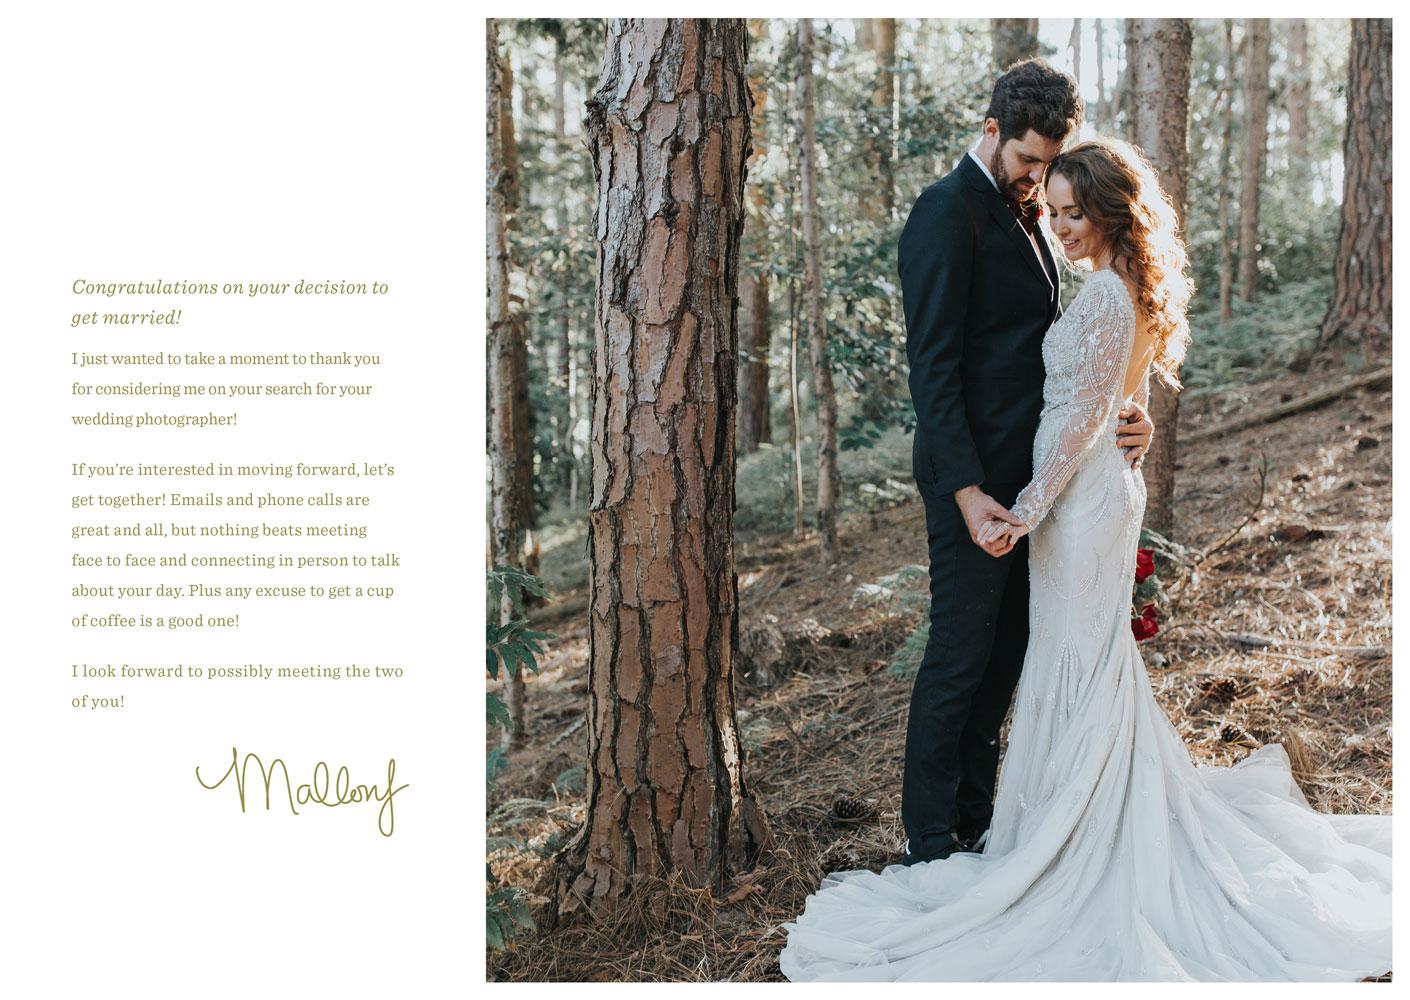 MallorySparkles_Weddings_20192.jpg